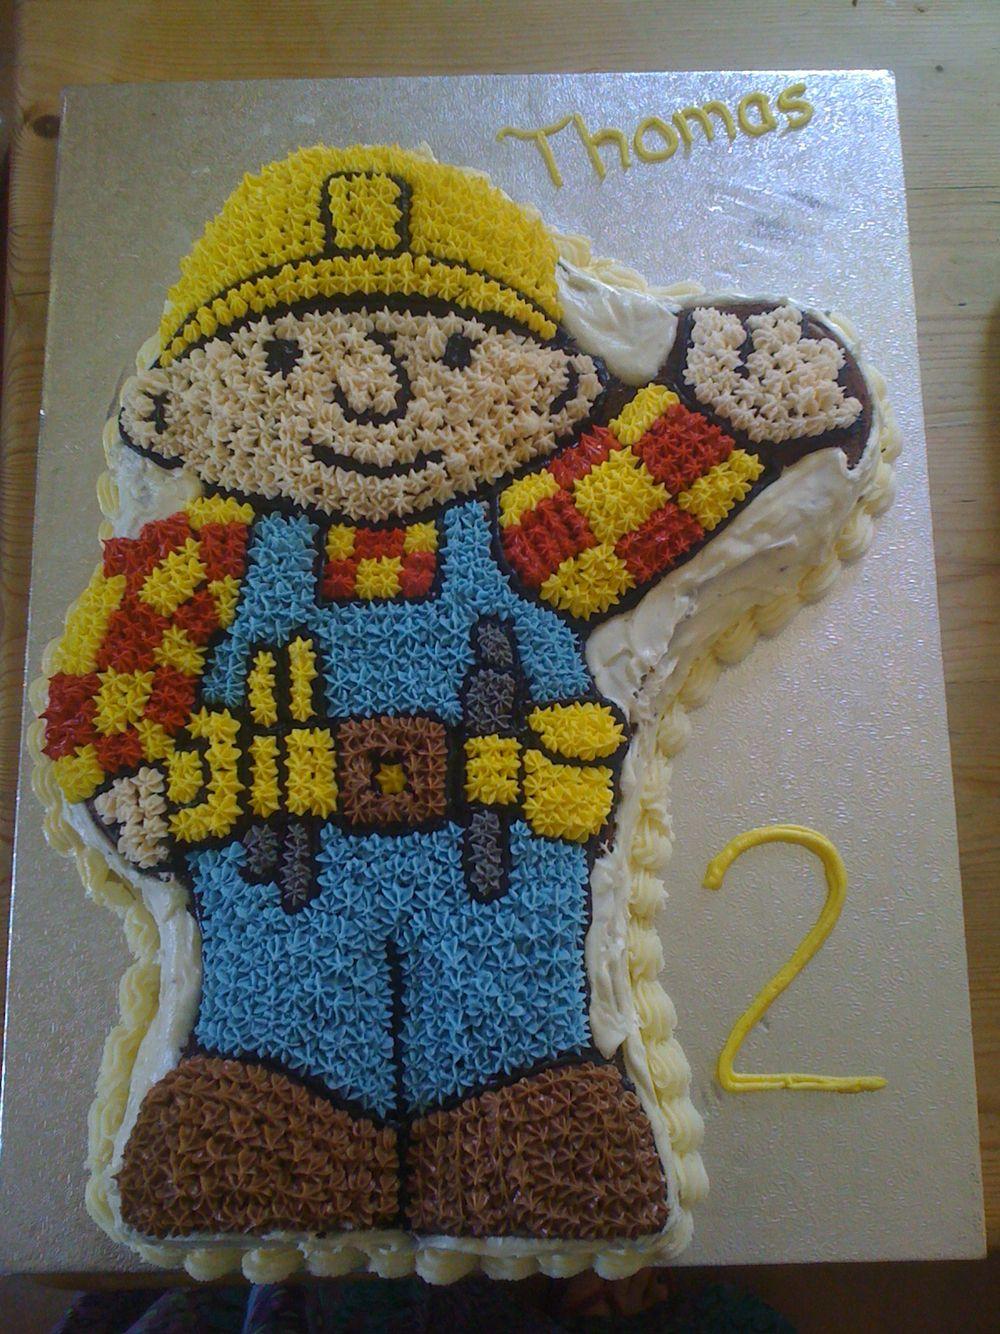 Bob the builder birthday cake | Birthday Parties | Pinterest | Bob ...